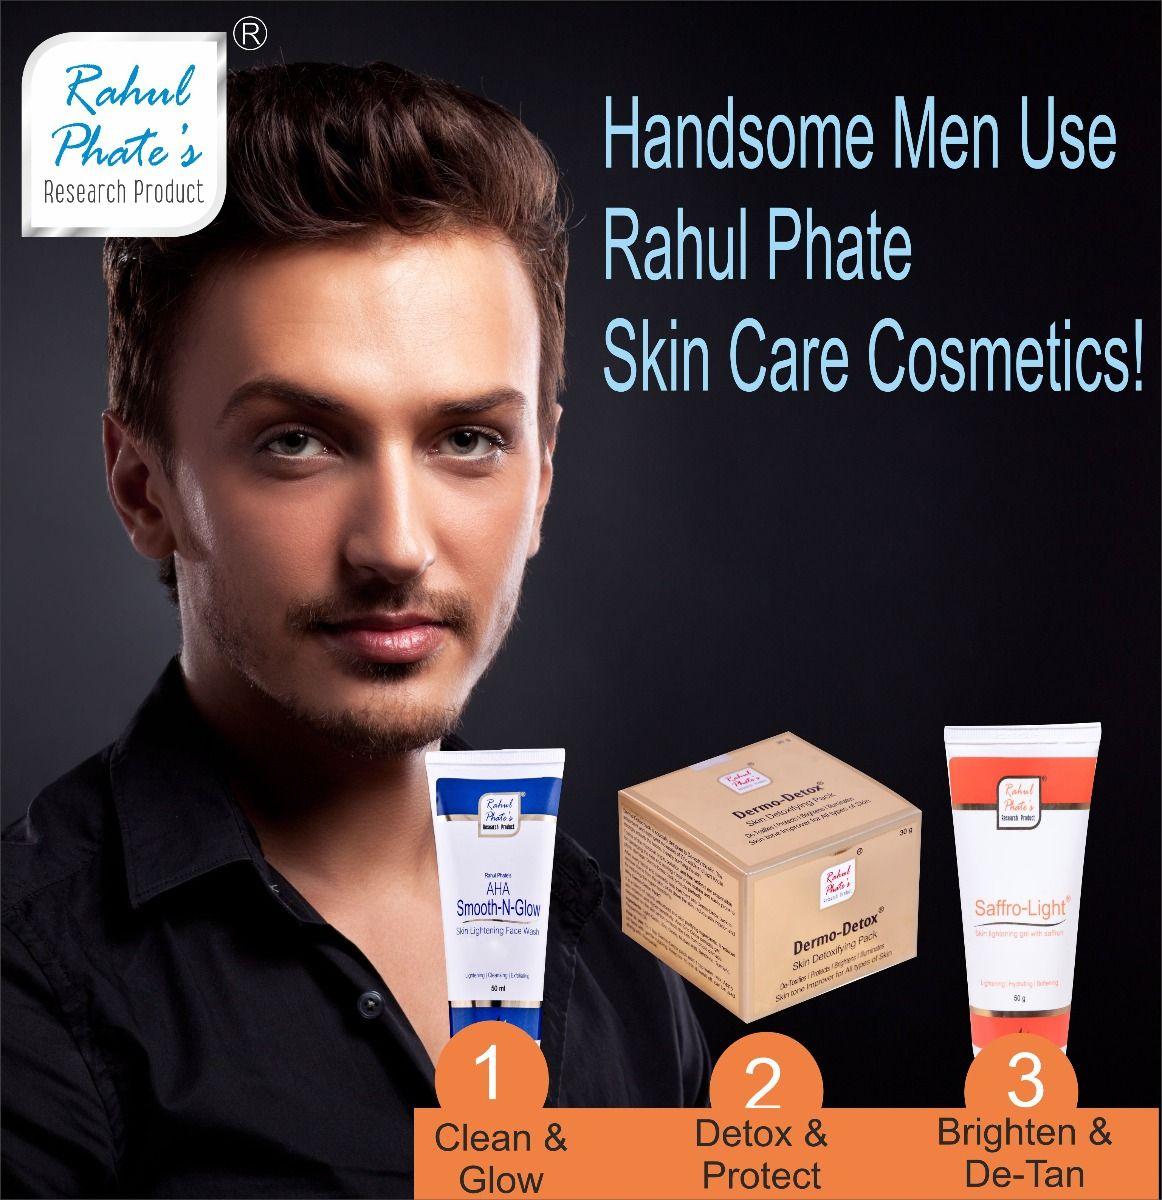 11 ways to beautiful skin with dark Complexion through Rahul Phates